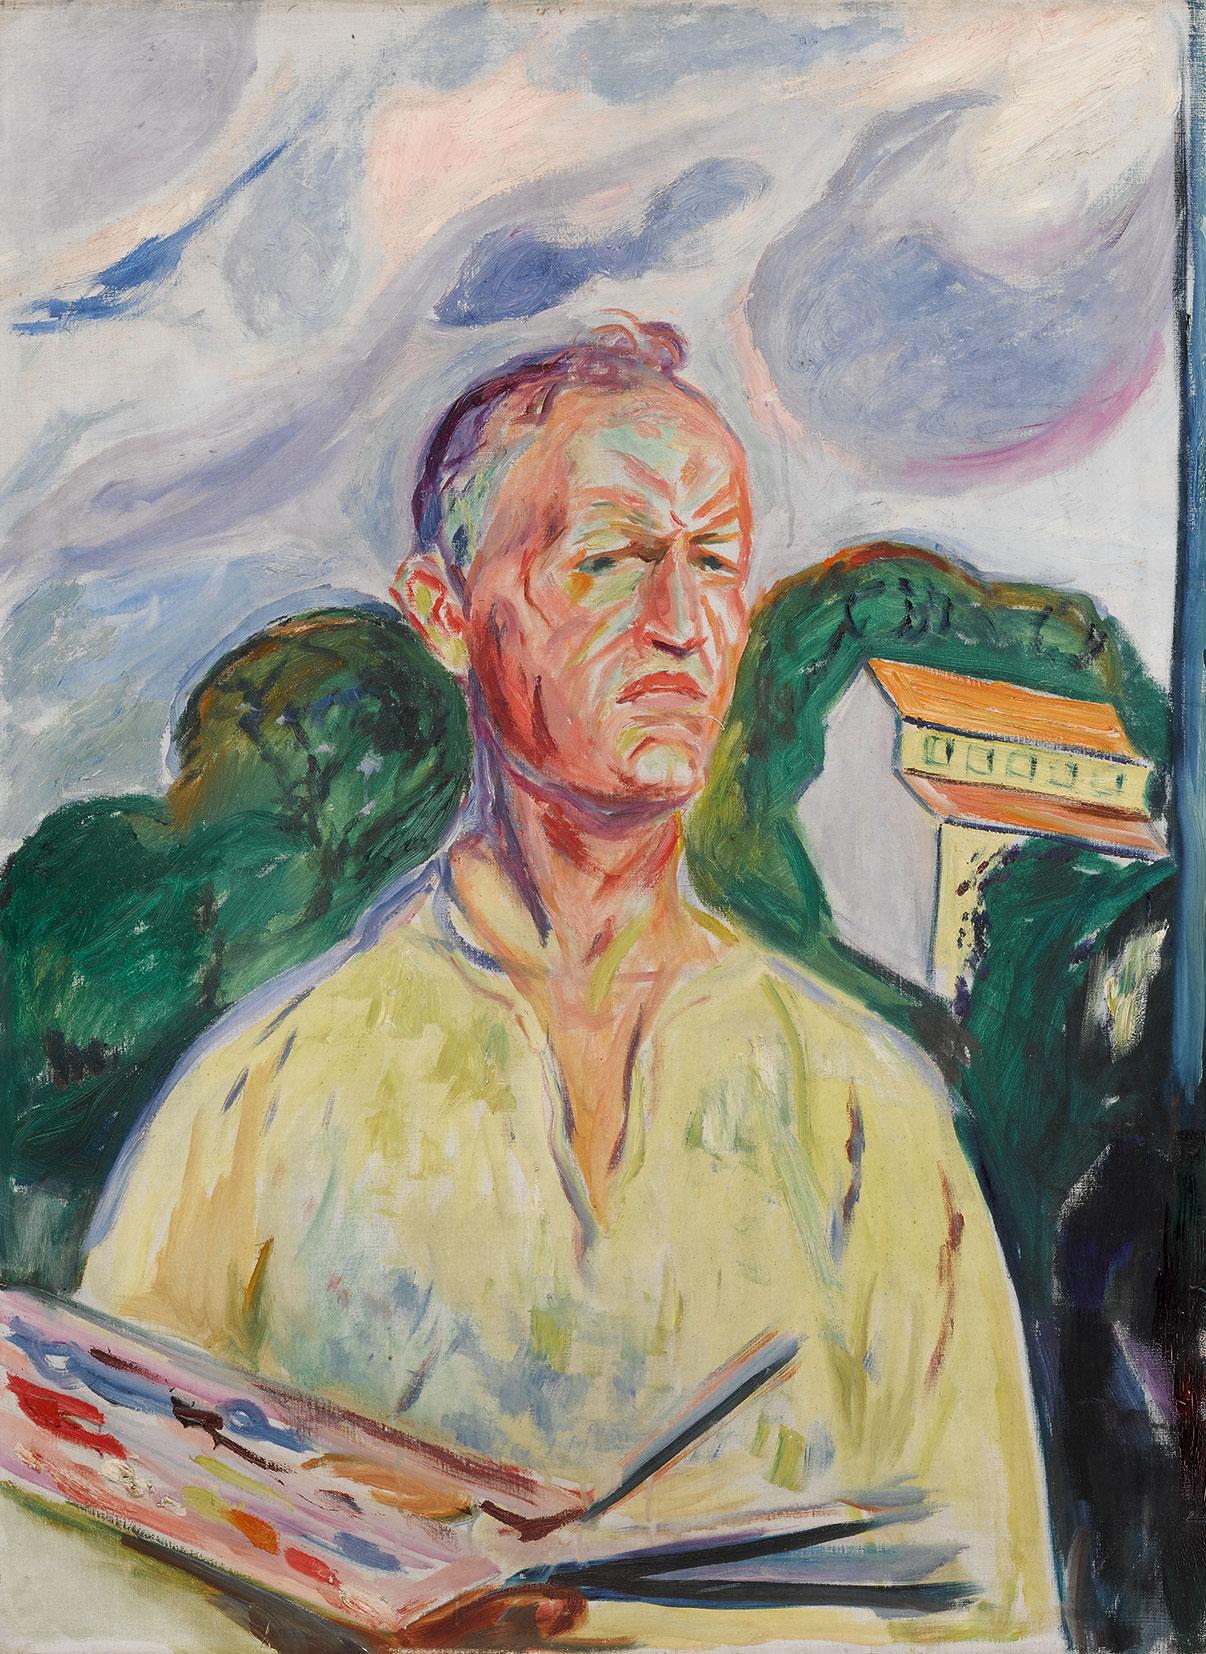 Lot-114,-Edvard-Munch,-Self-Portrait-with-Palette,-est_-£4_5-6.jpg